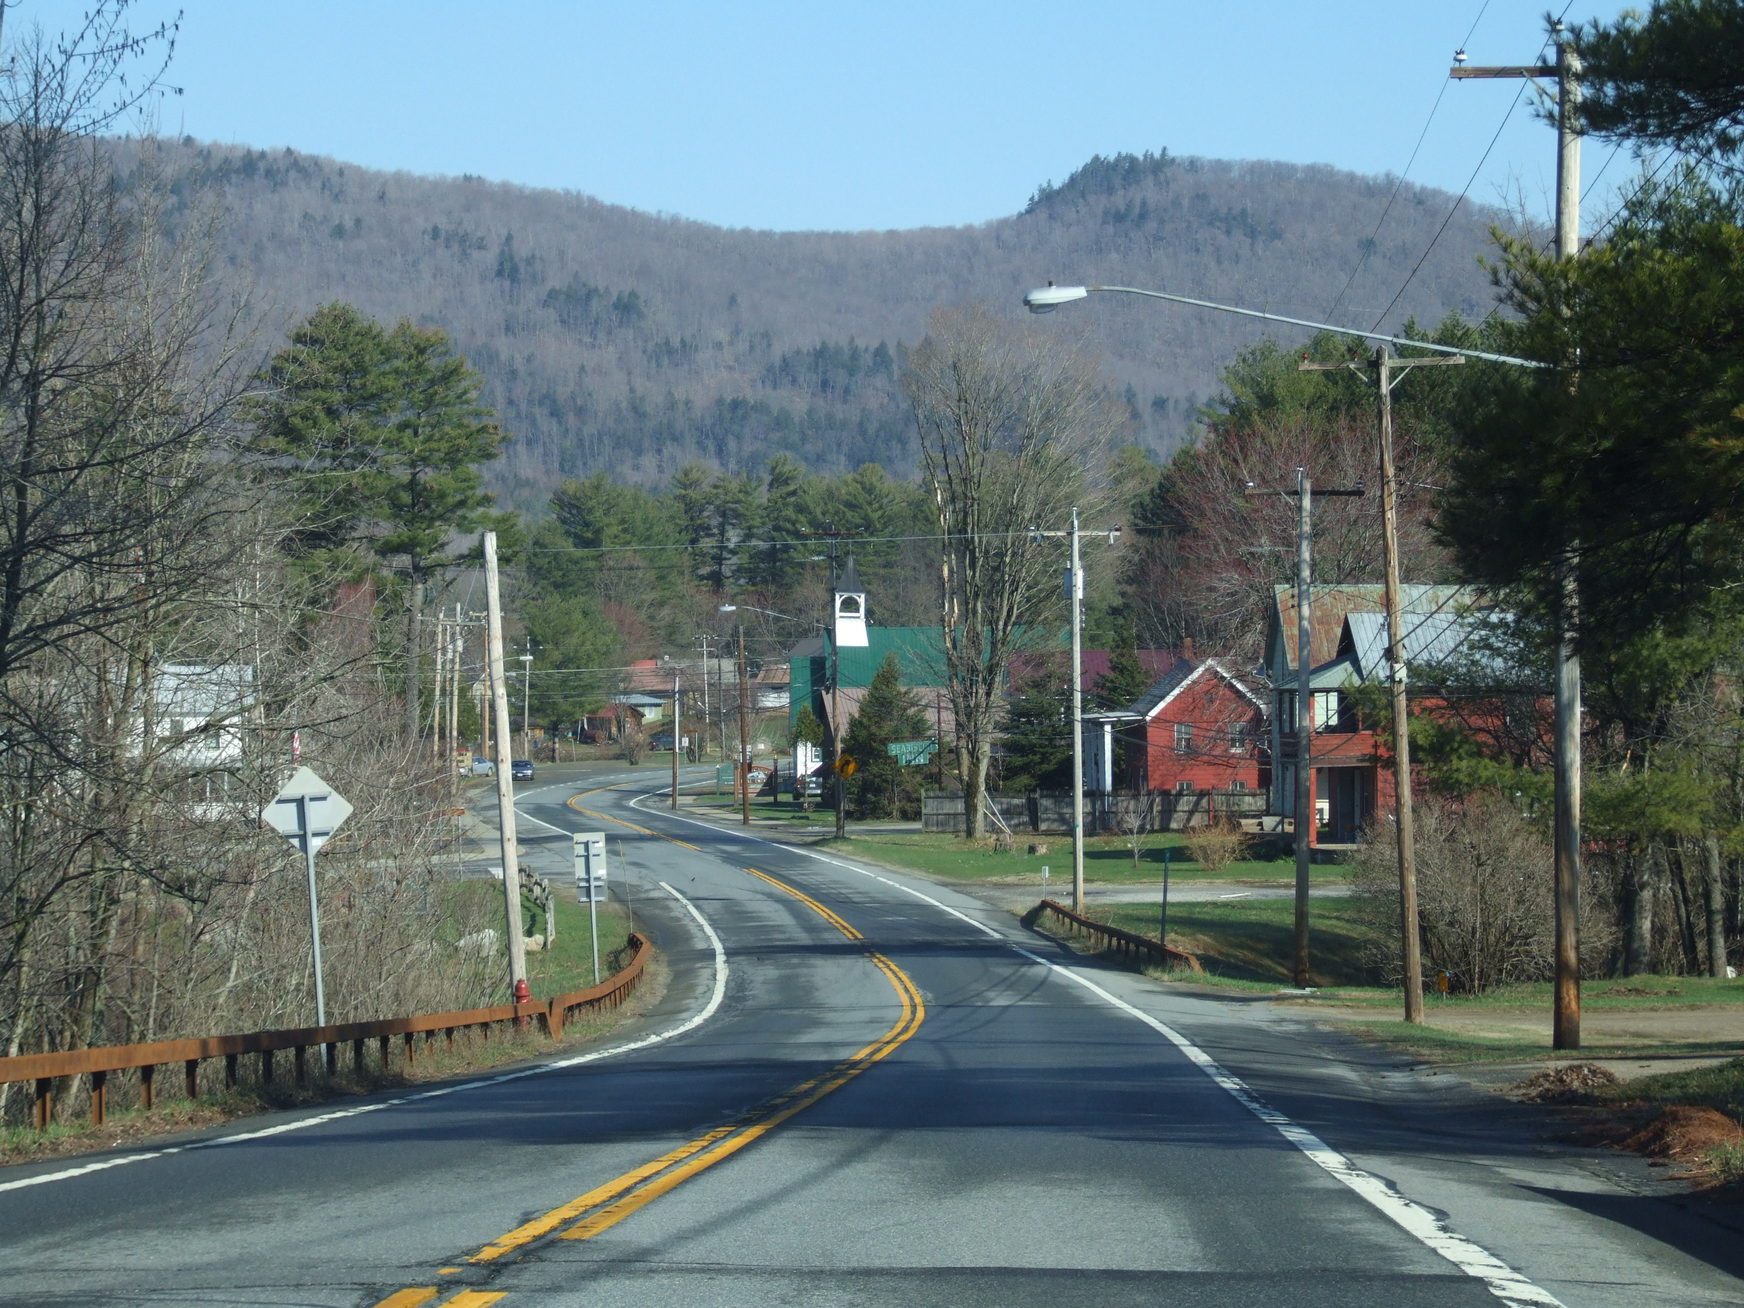 New york hamilton county sabael 12864 -  Larger 1744x1308